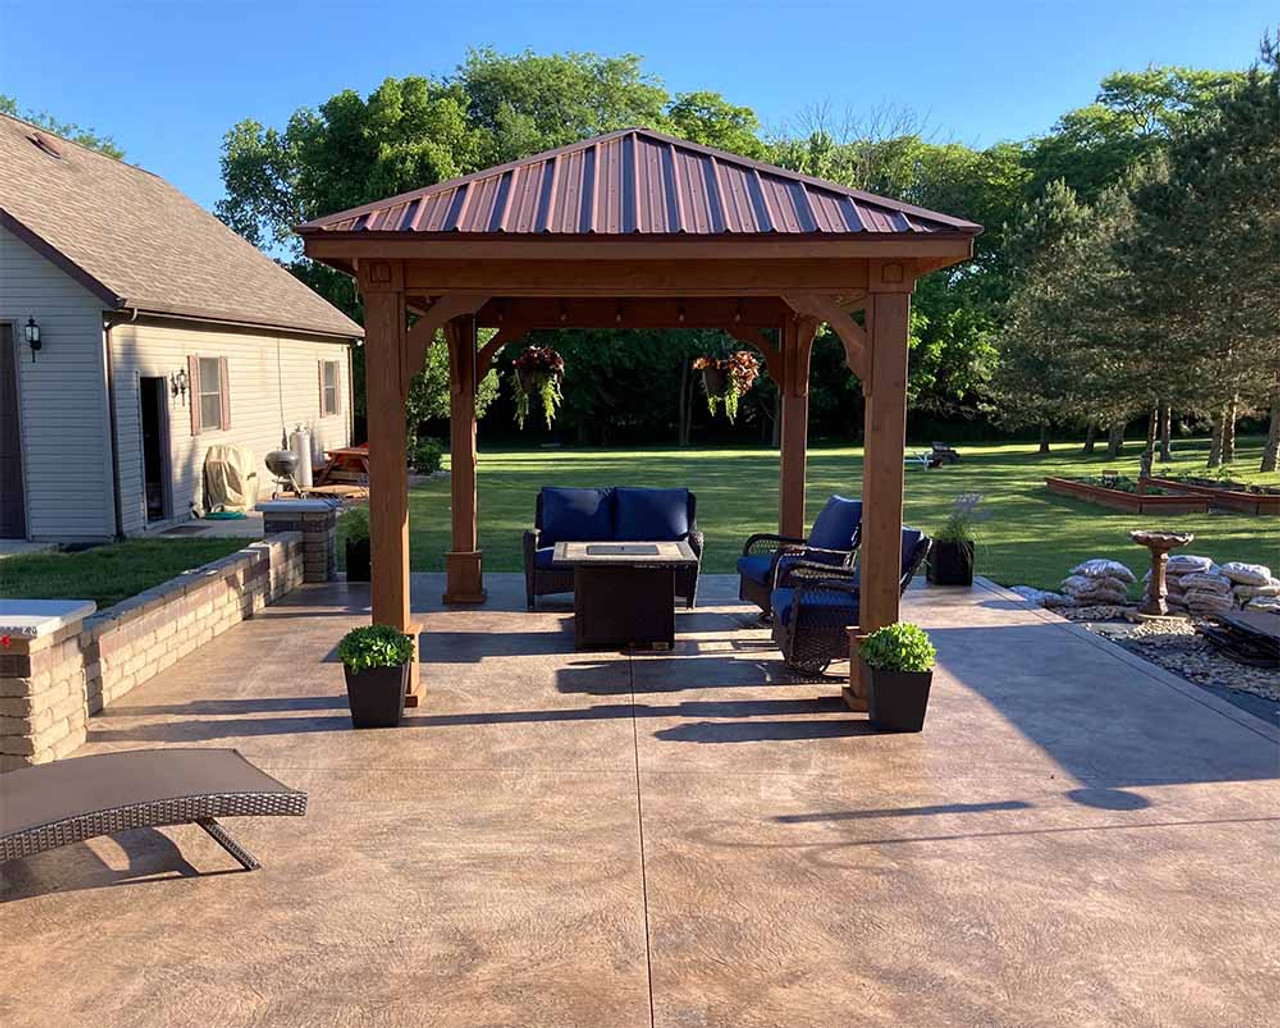 10x12 Traditional(Hip) Cedar Pavilion St. Marys, Ohio